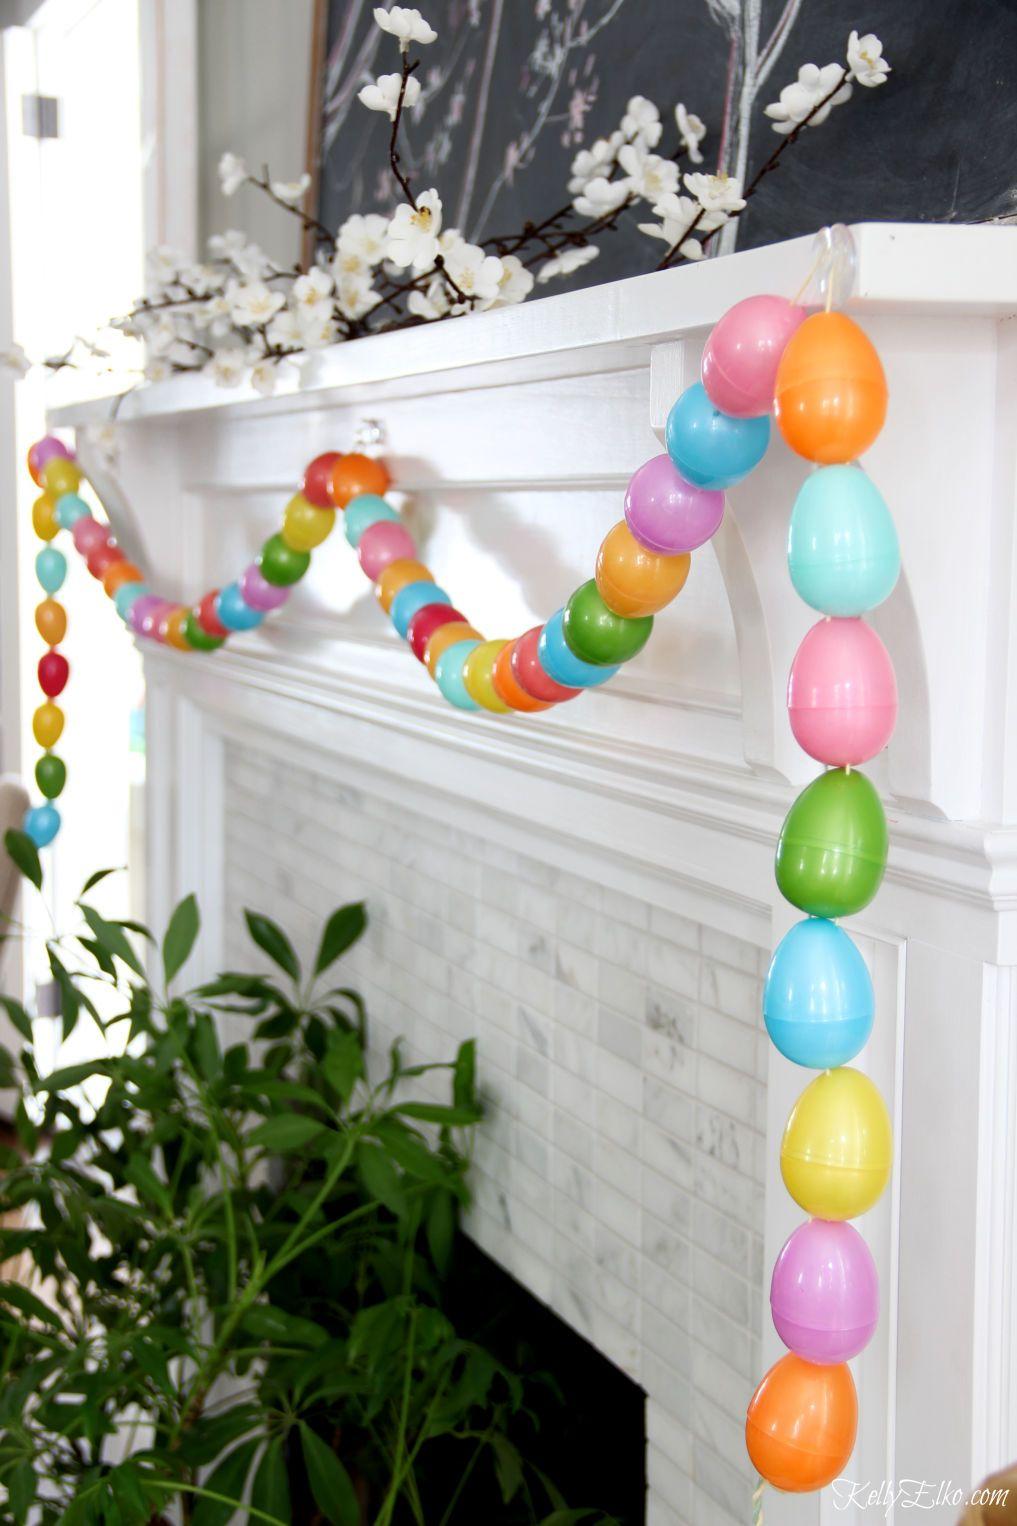 DIY egg garland kellyelko.com #crafts #springcrafts #eastercrafts #eastereggs #garland #springdecor #kidscrafts